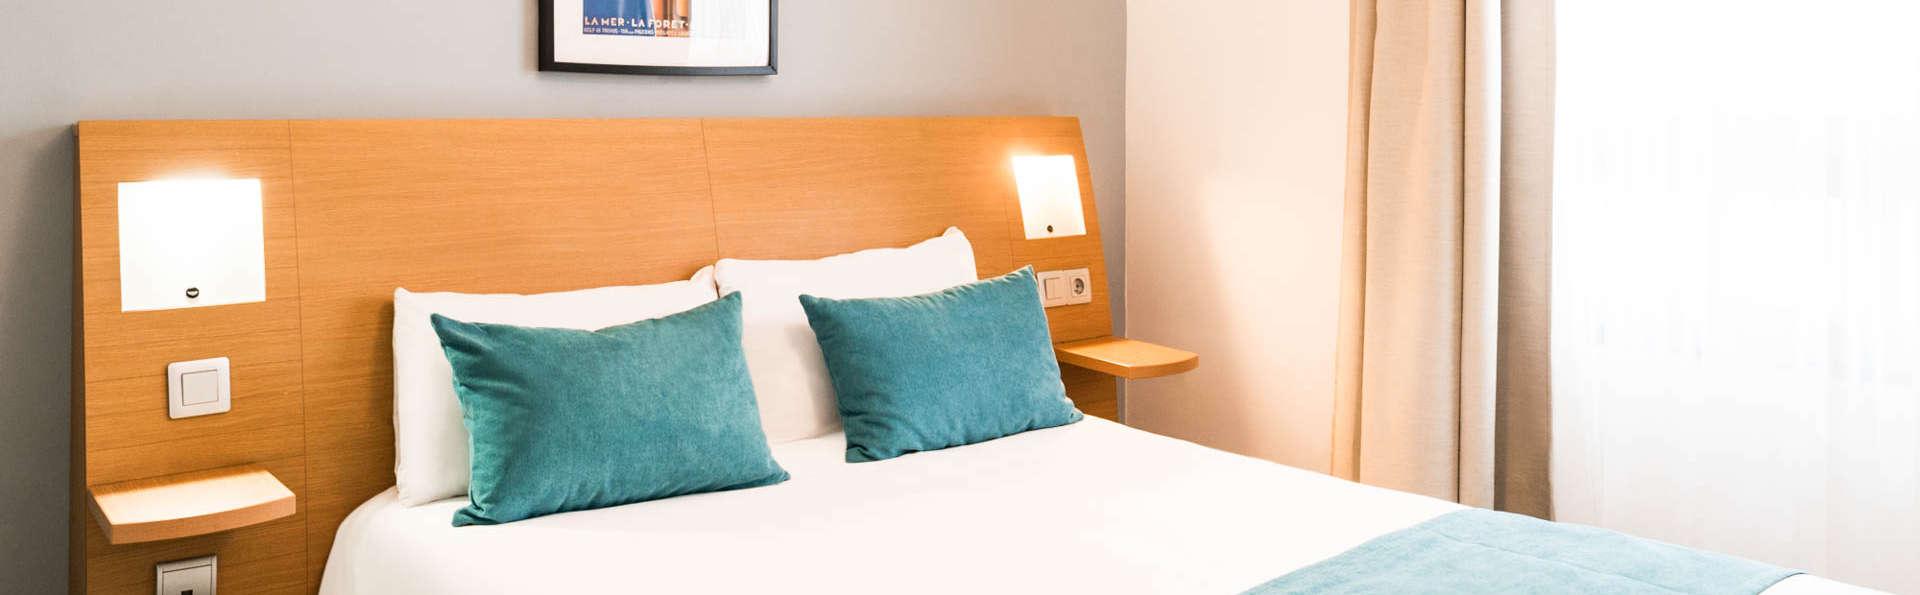 Hotel The Originals Royan Foncillon (ex Inter-Hotel) - EDIT_NEW_ROOM-4.jpg